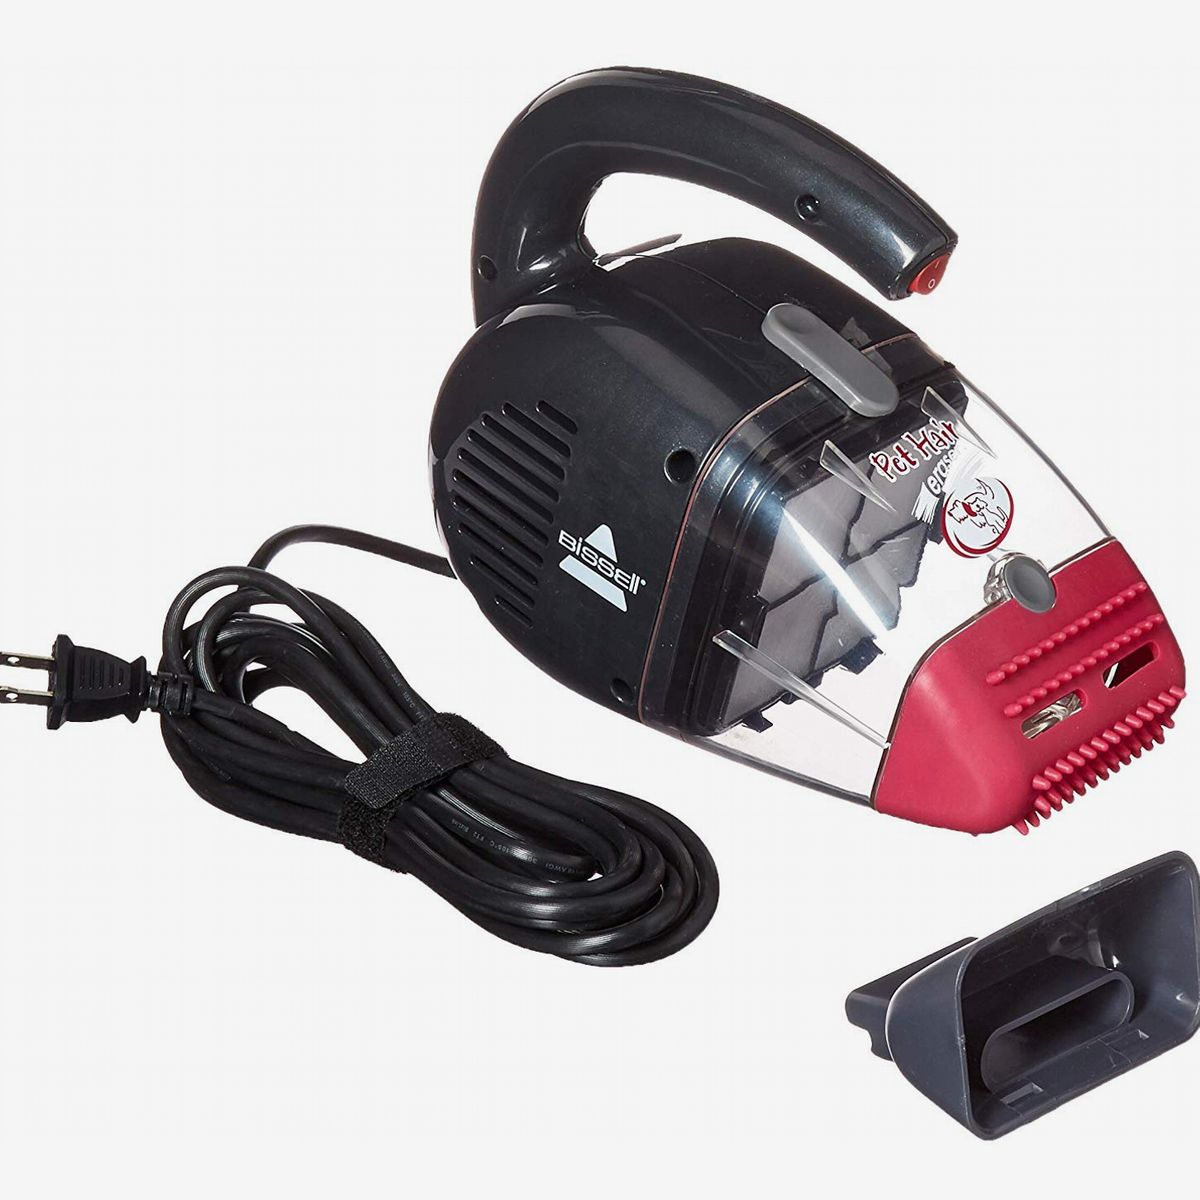 12 Best Handheld Vacuums 2020 The Strategist New York Magazine